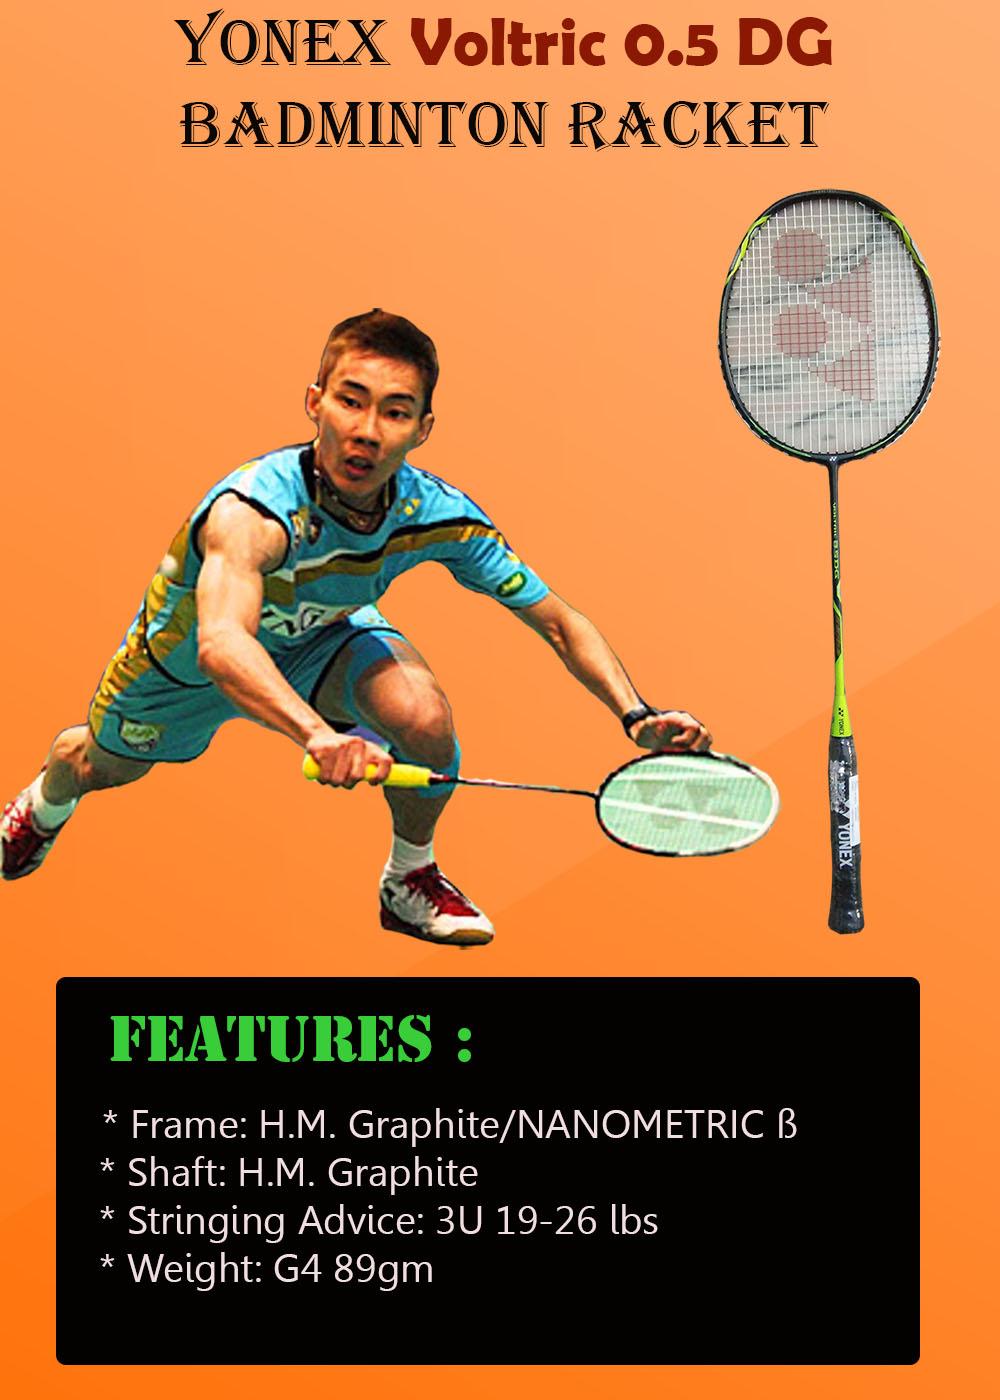 Yonex Voltric 0 5 DG Badminton Racket